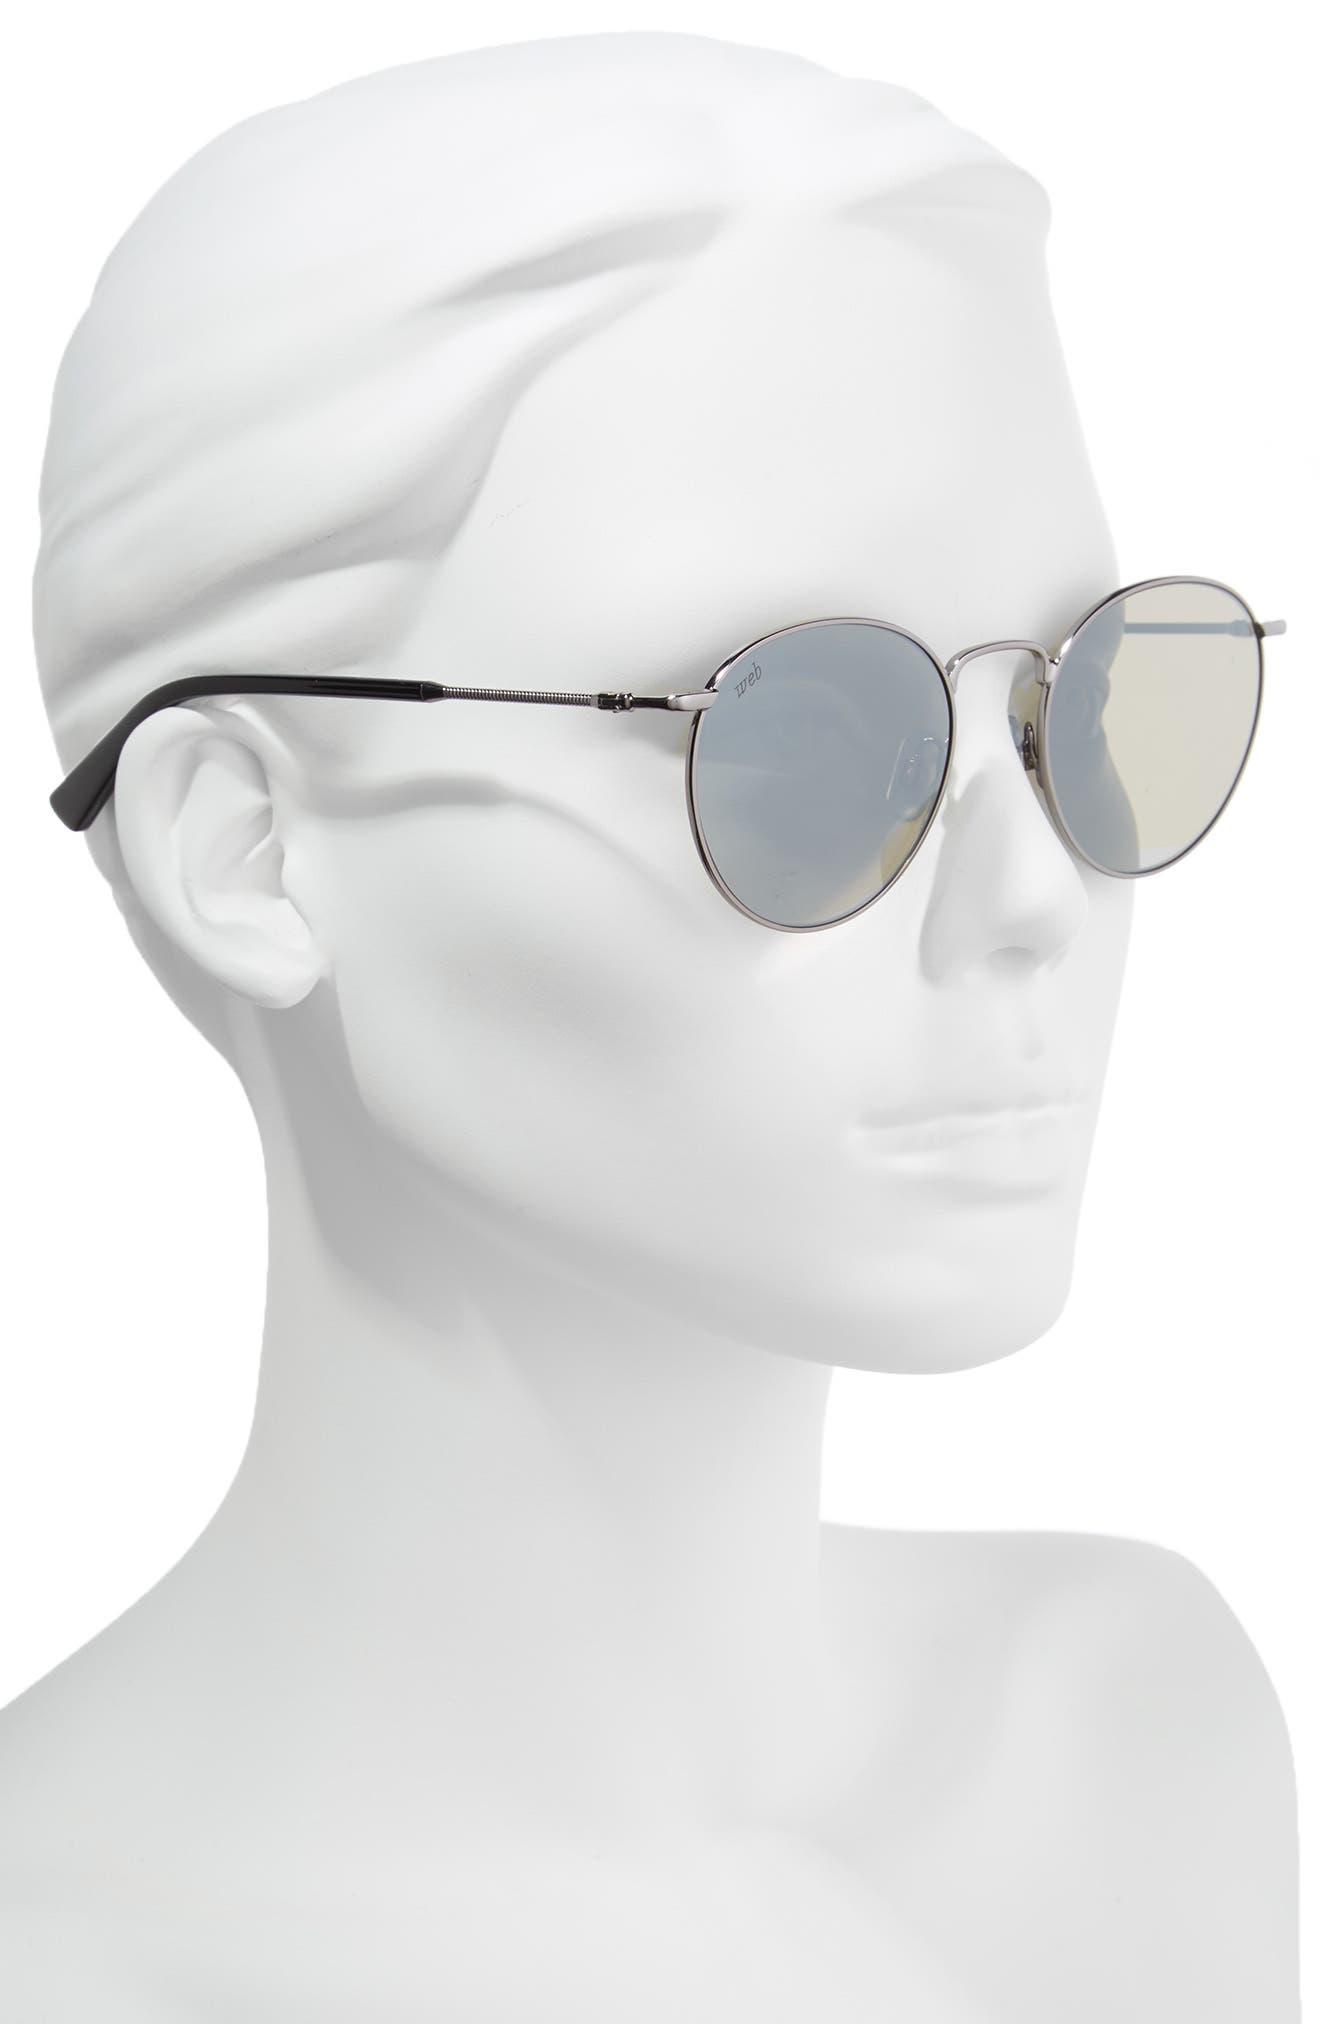 51mm Round Metal Sunglasses,                             Alternate thumbnail 2, color,                             SHINY GUNMETAL/ ROVIEX MIRROR